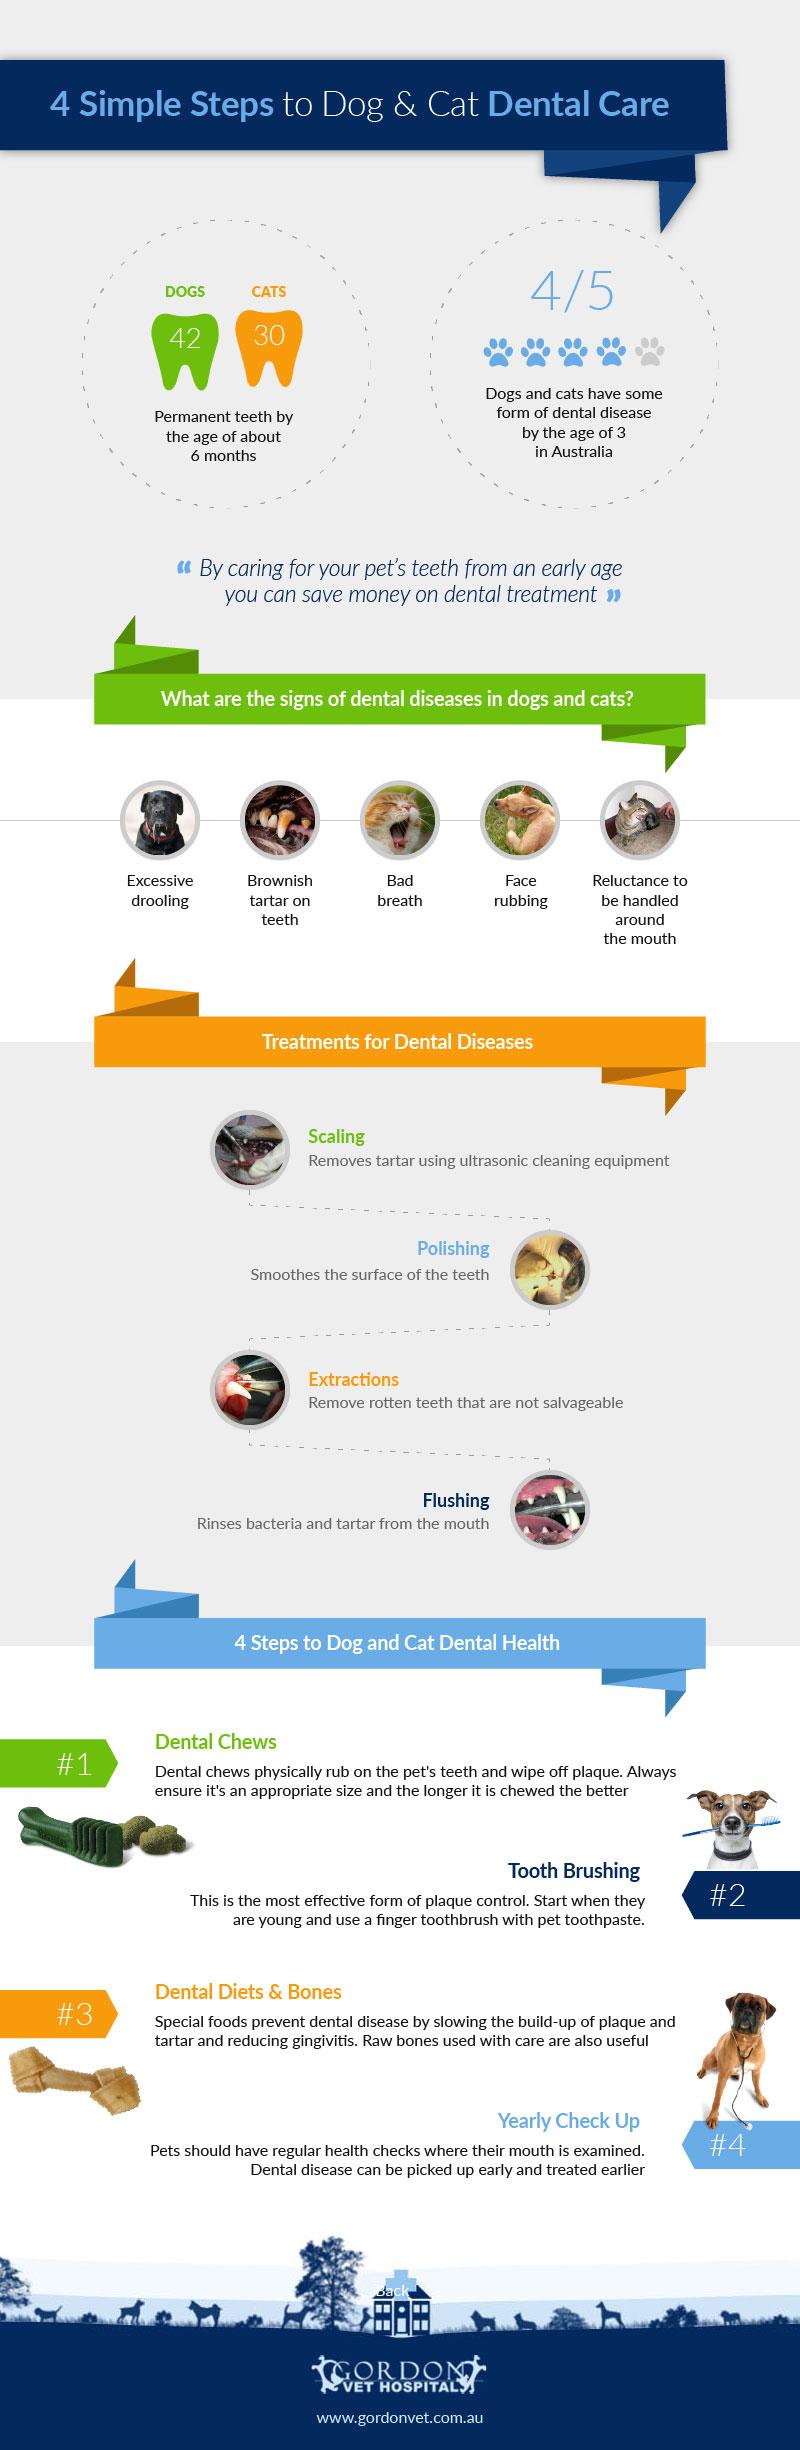 4 Simple Steps to Dog & Cat Dental Care